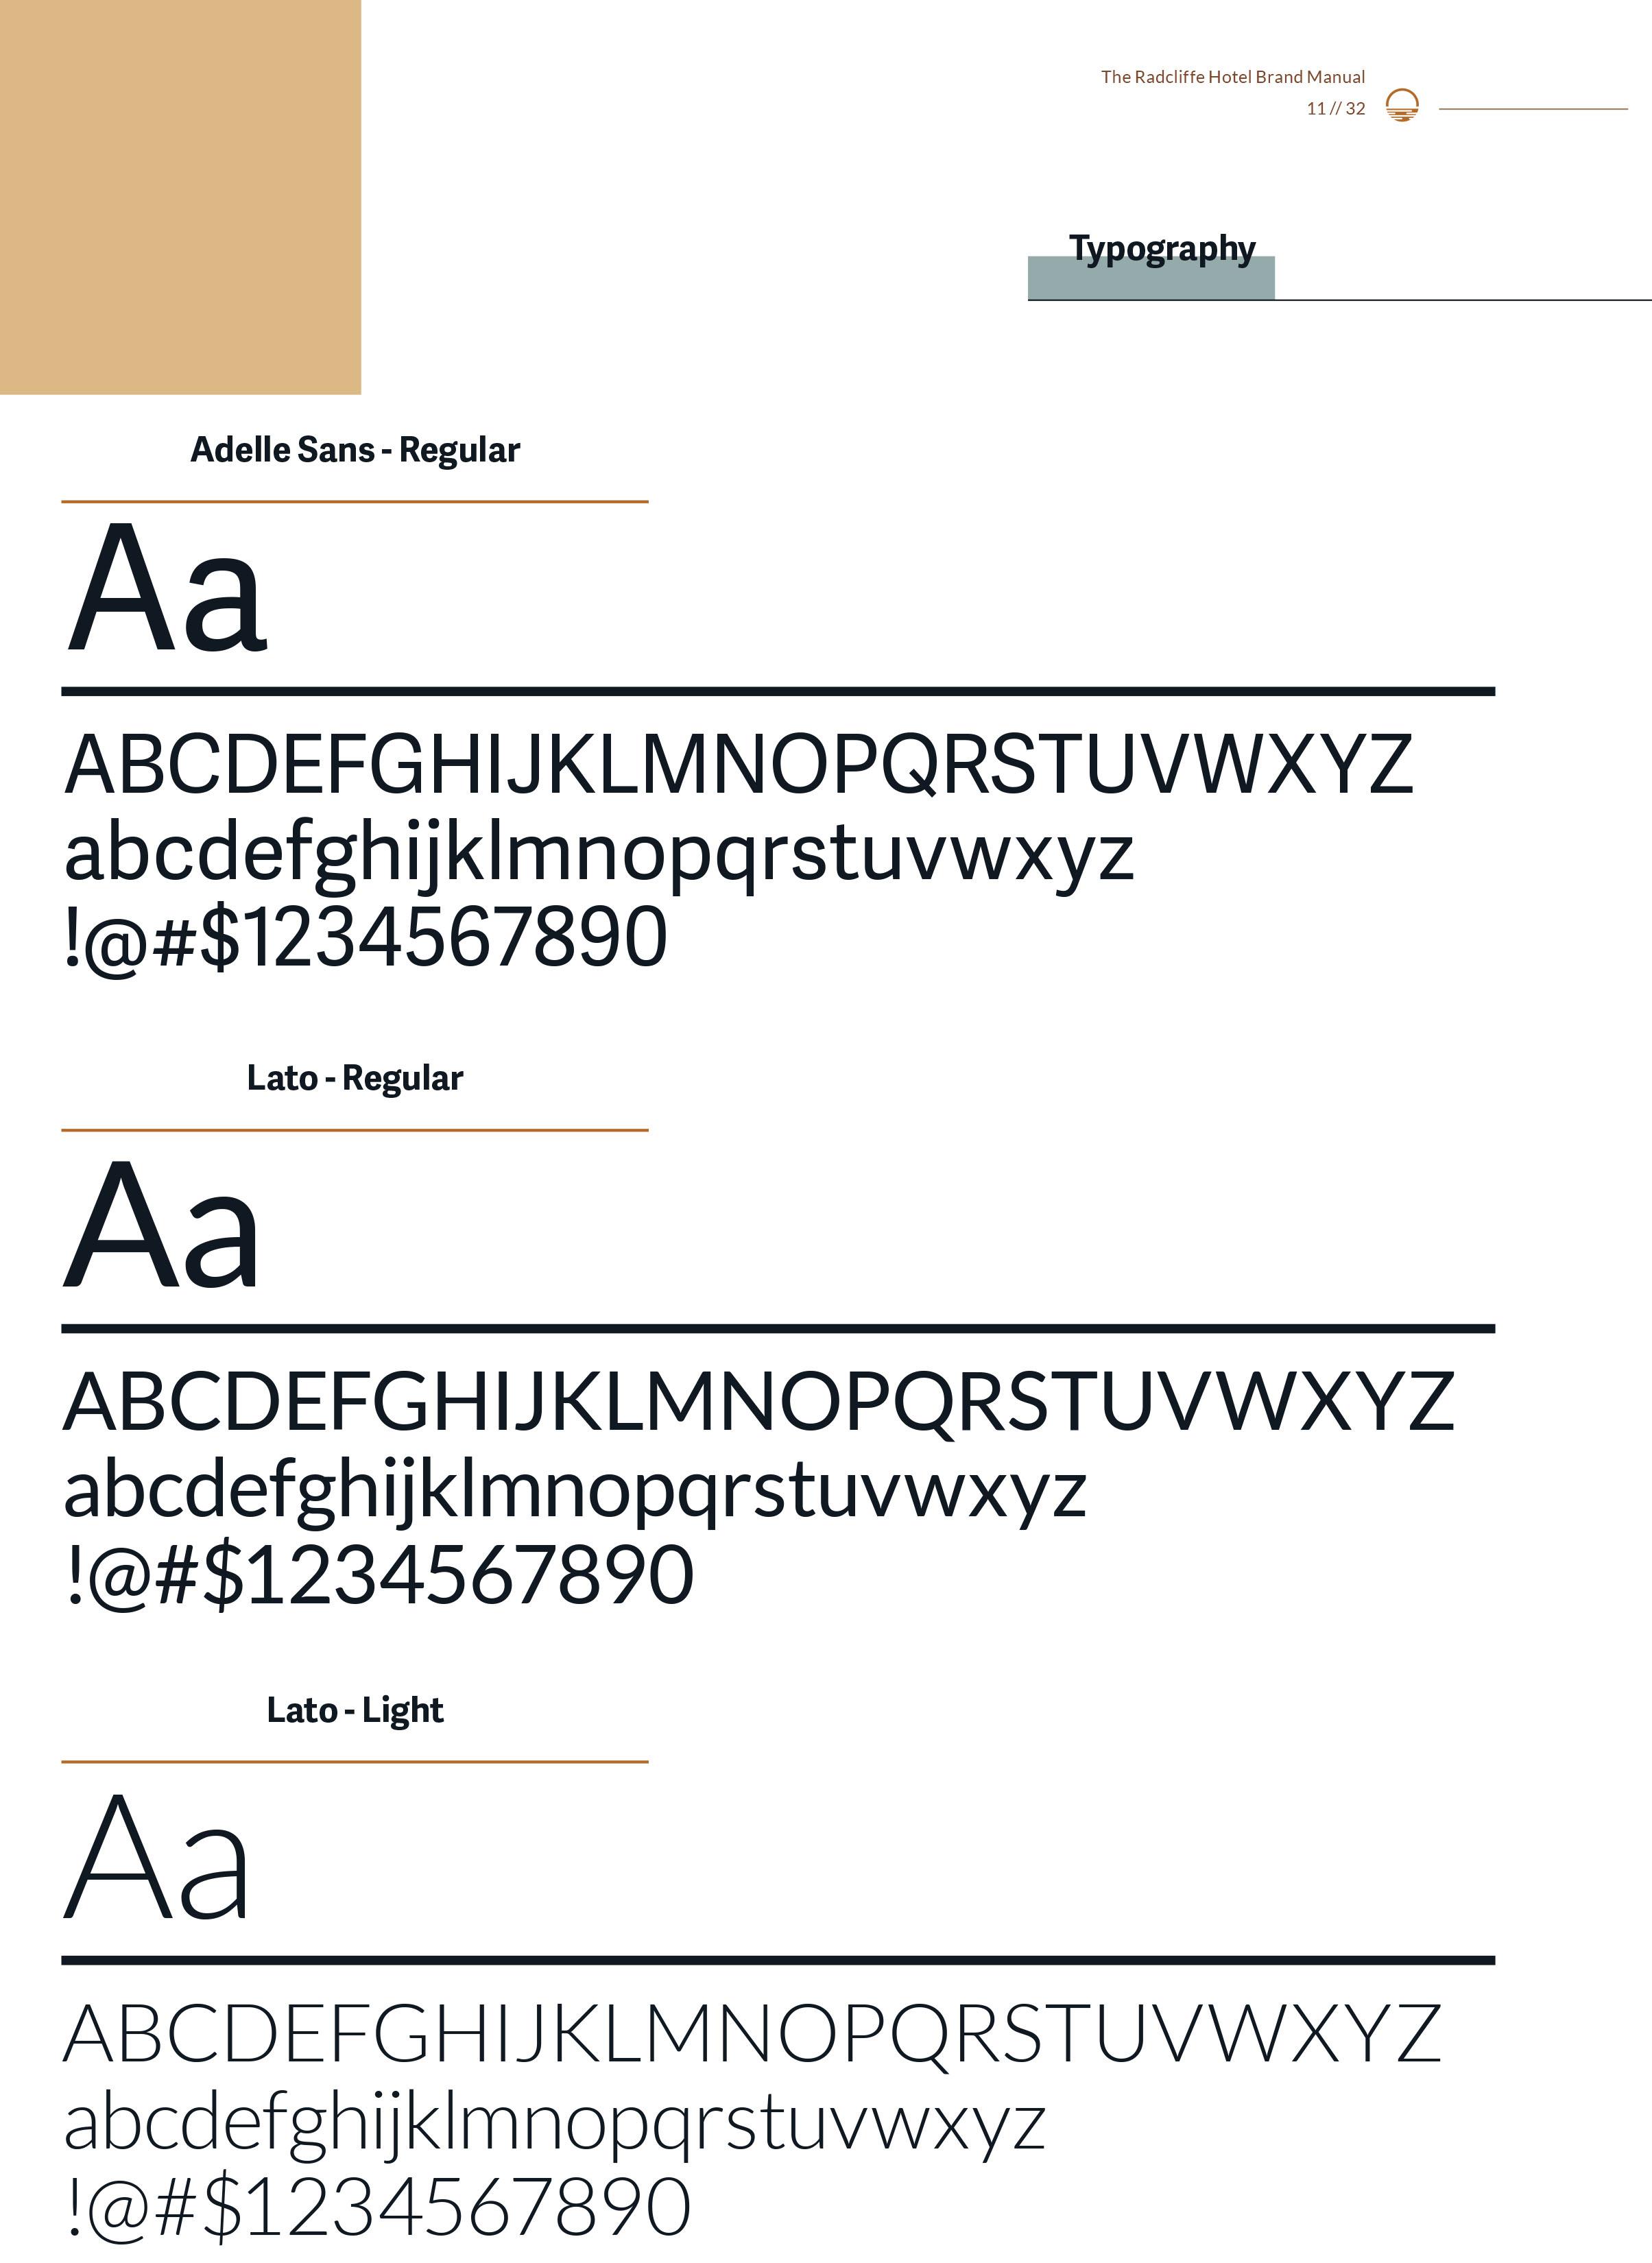 Brand Manual 10.jpg